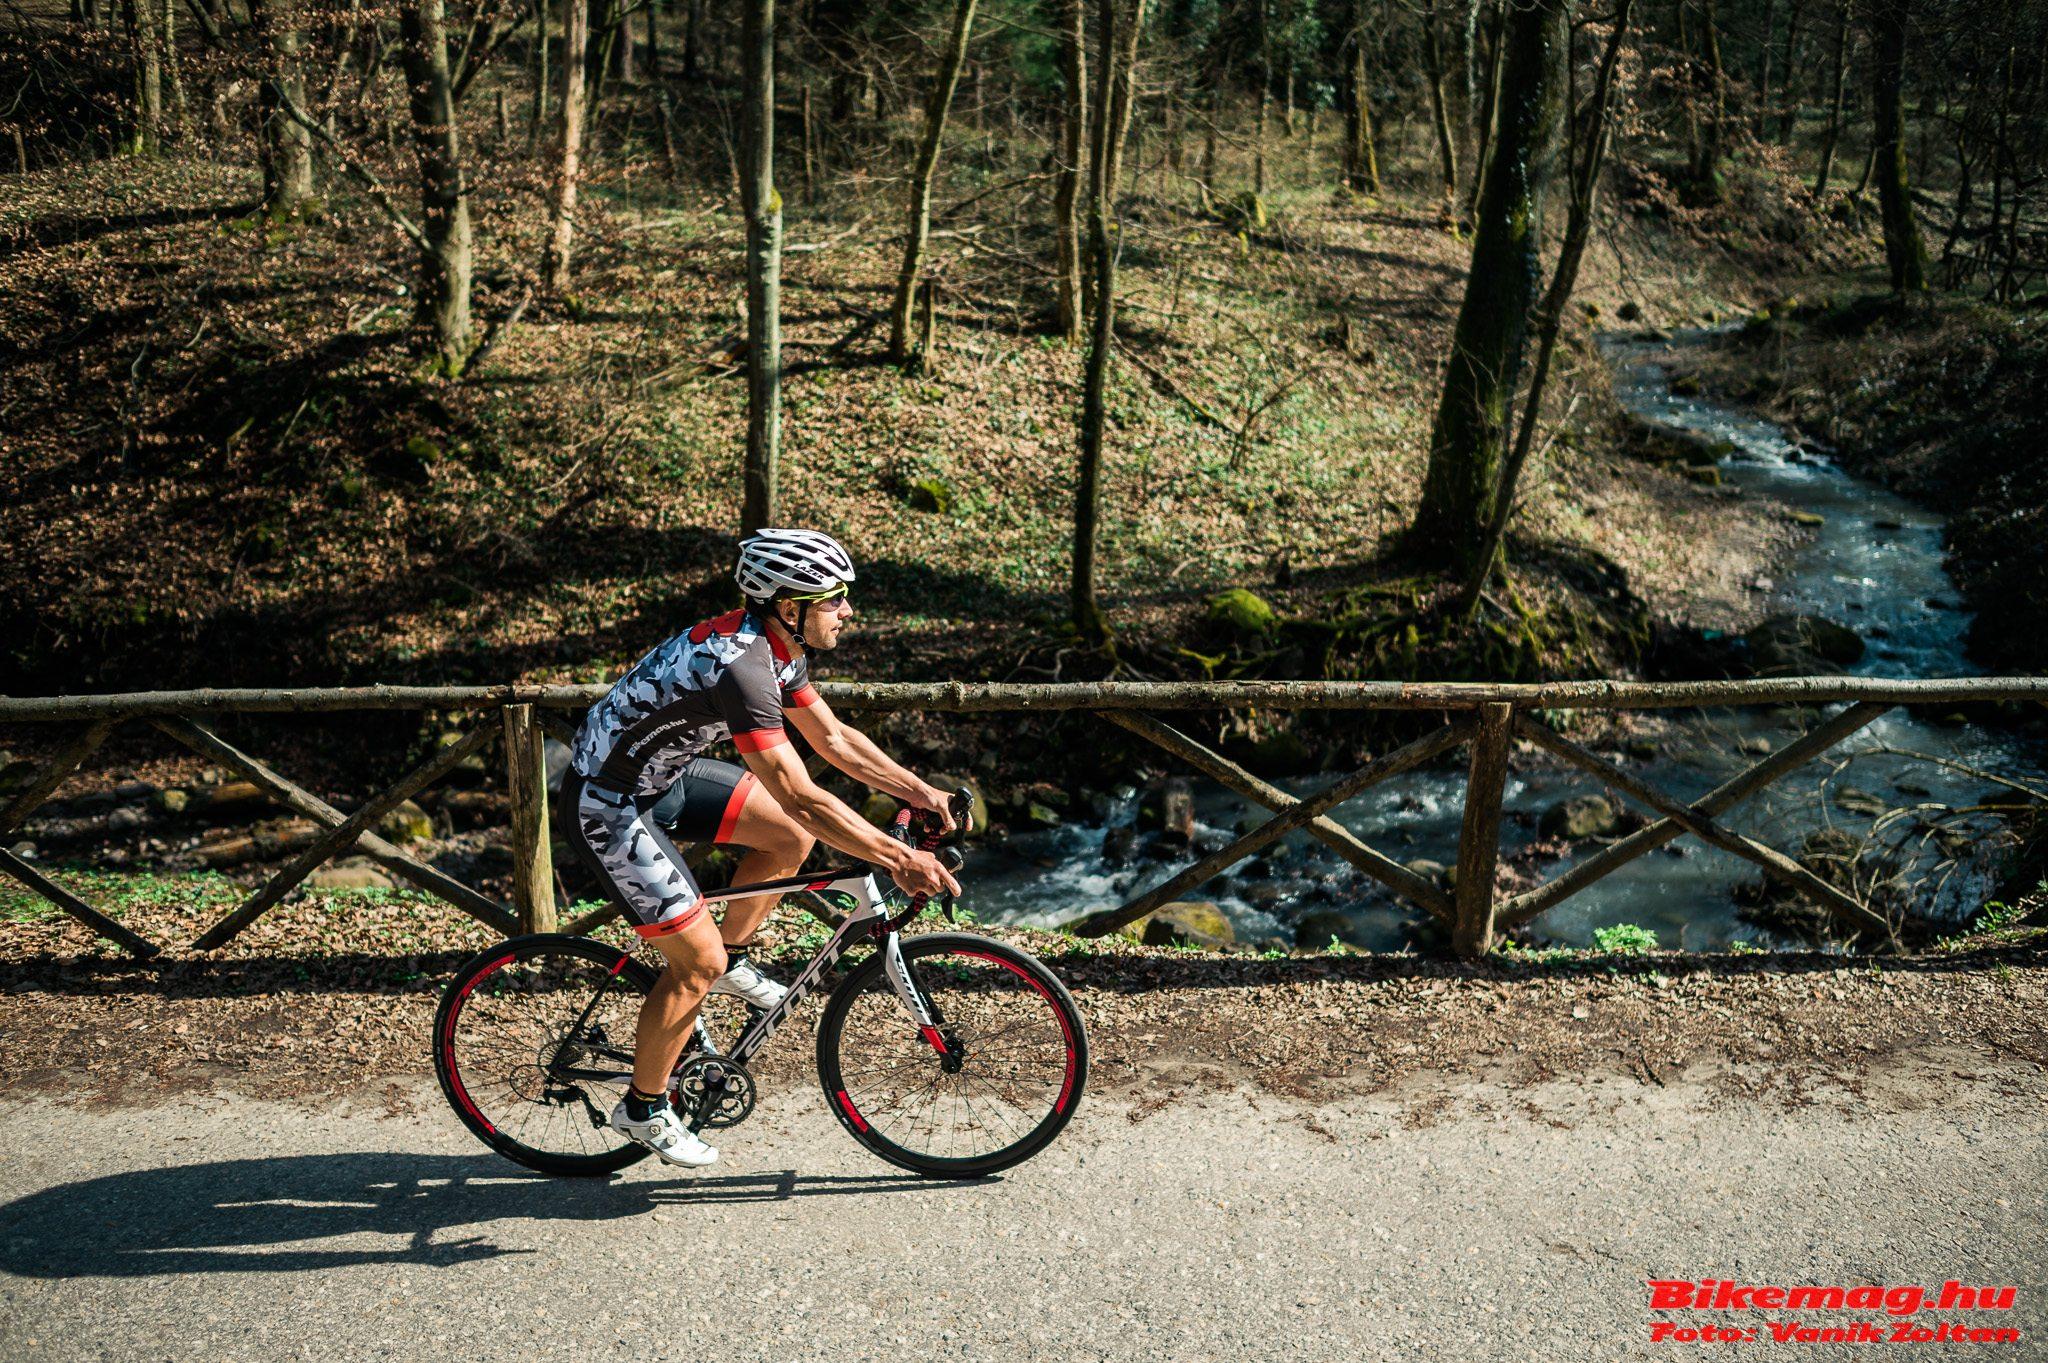 www.facebook.com/VanikZoltanFoto